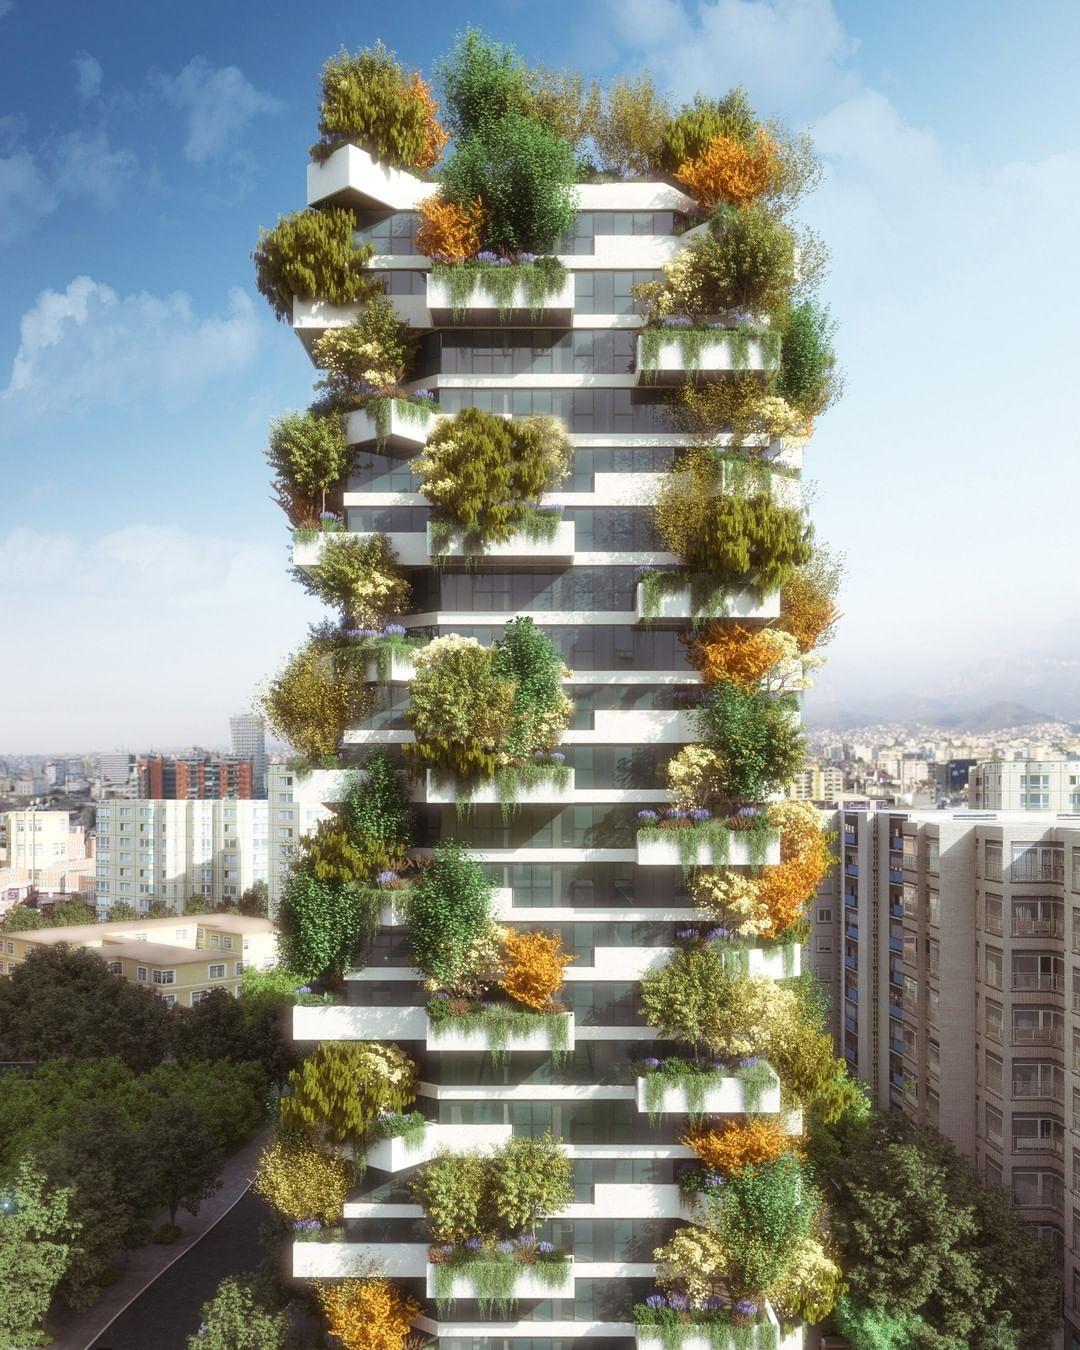 Modern Italian Garden Design: Italian Architect @stefanoboeriarchitetti Has Designed A